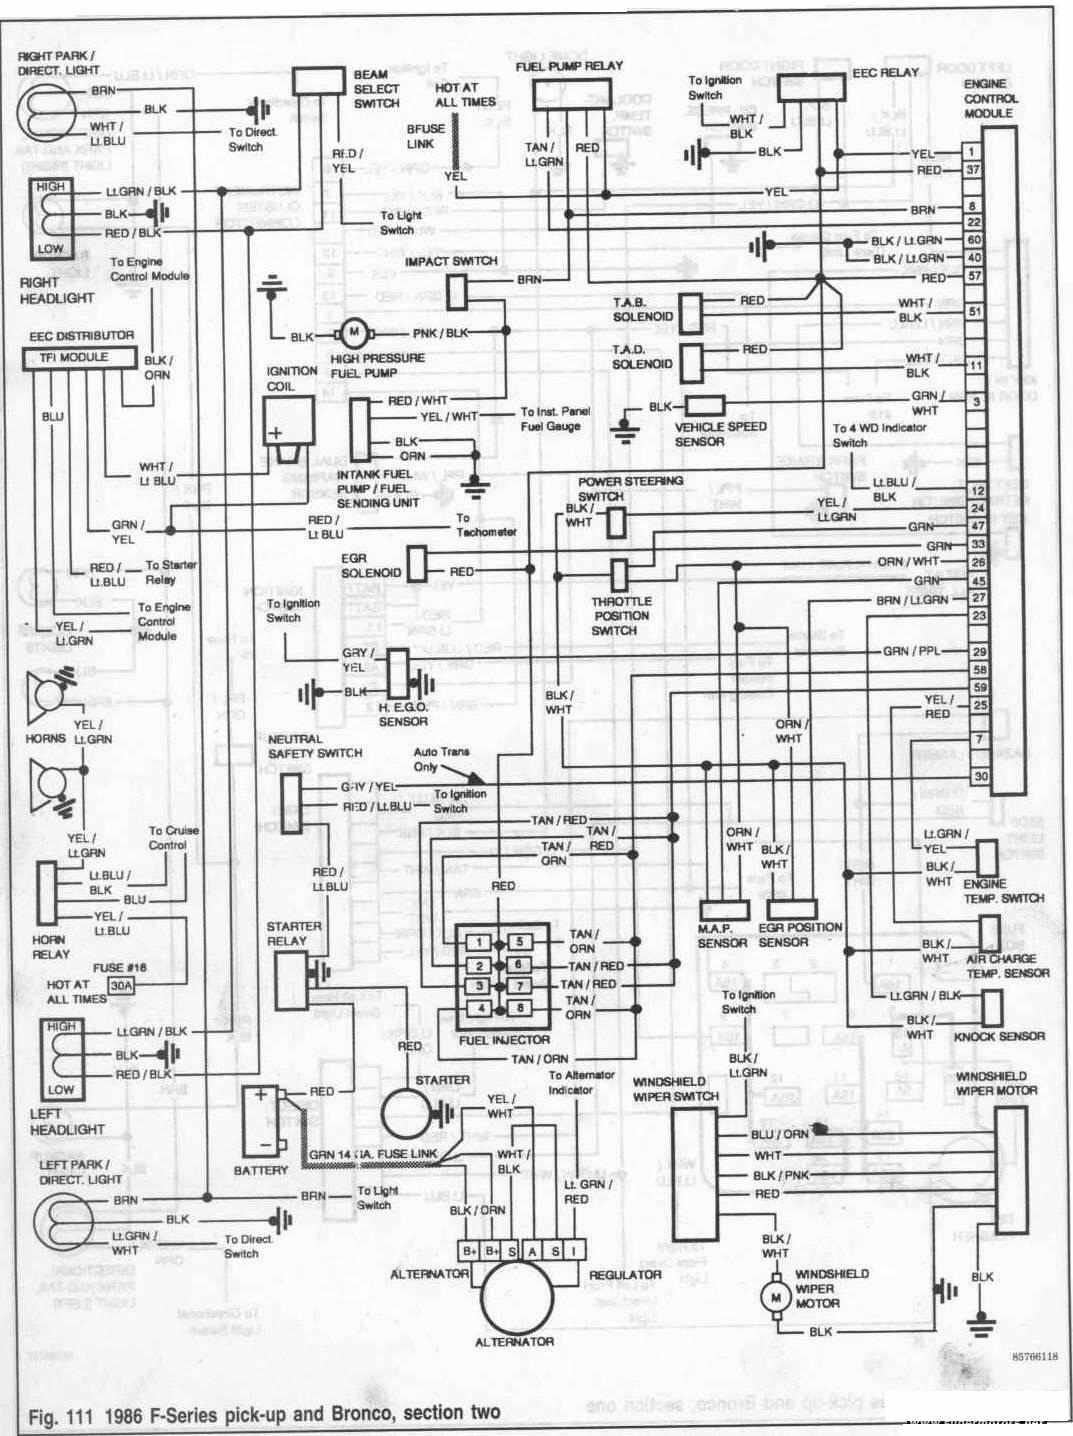 [DIAGRAM_5NL]  TH_9059] 89 Ford Bronco 2 Fuse Box Diagram Free Diagram | Bronco 2 Wiring Diagram Headlight Switch |  | Ginia Atolo Usnes Adit None Stica Hapolo Mohammedshrine Librar Wiring 101